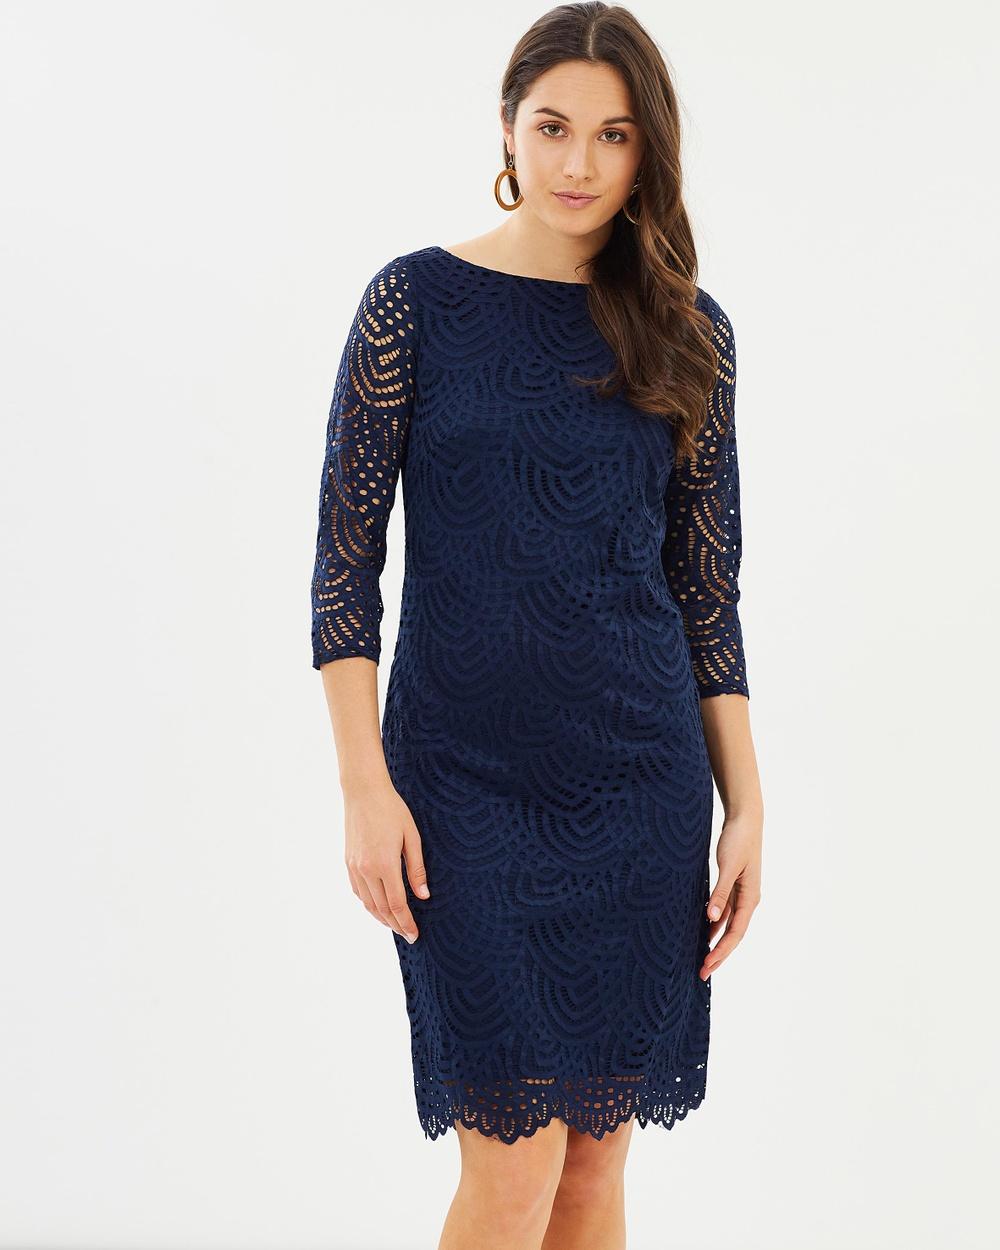 Wallis Lace Sleeved Shift Dress Dresses Navy Blue Lace Sleeved Shift Dress